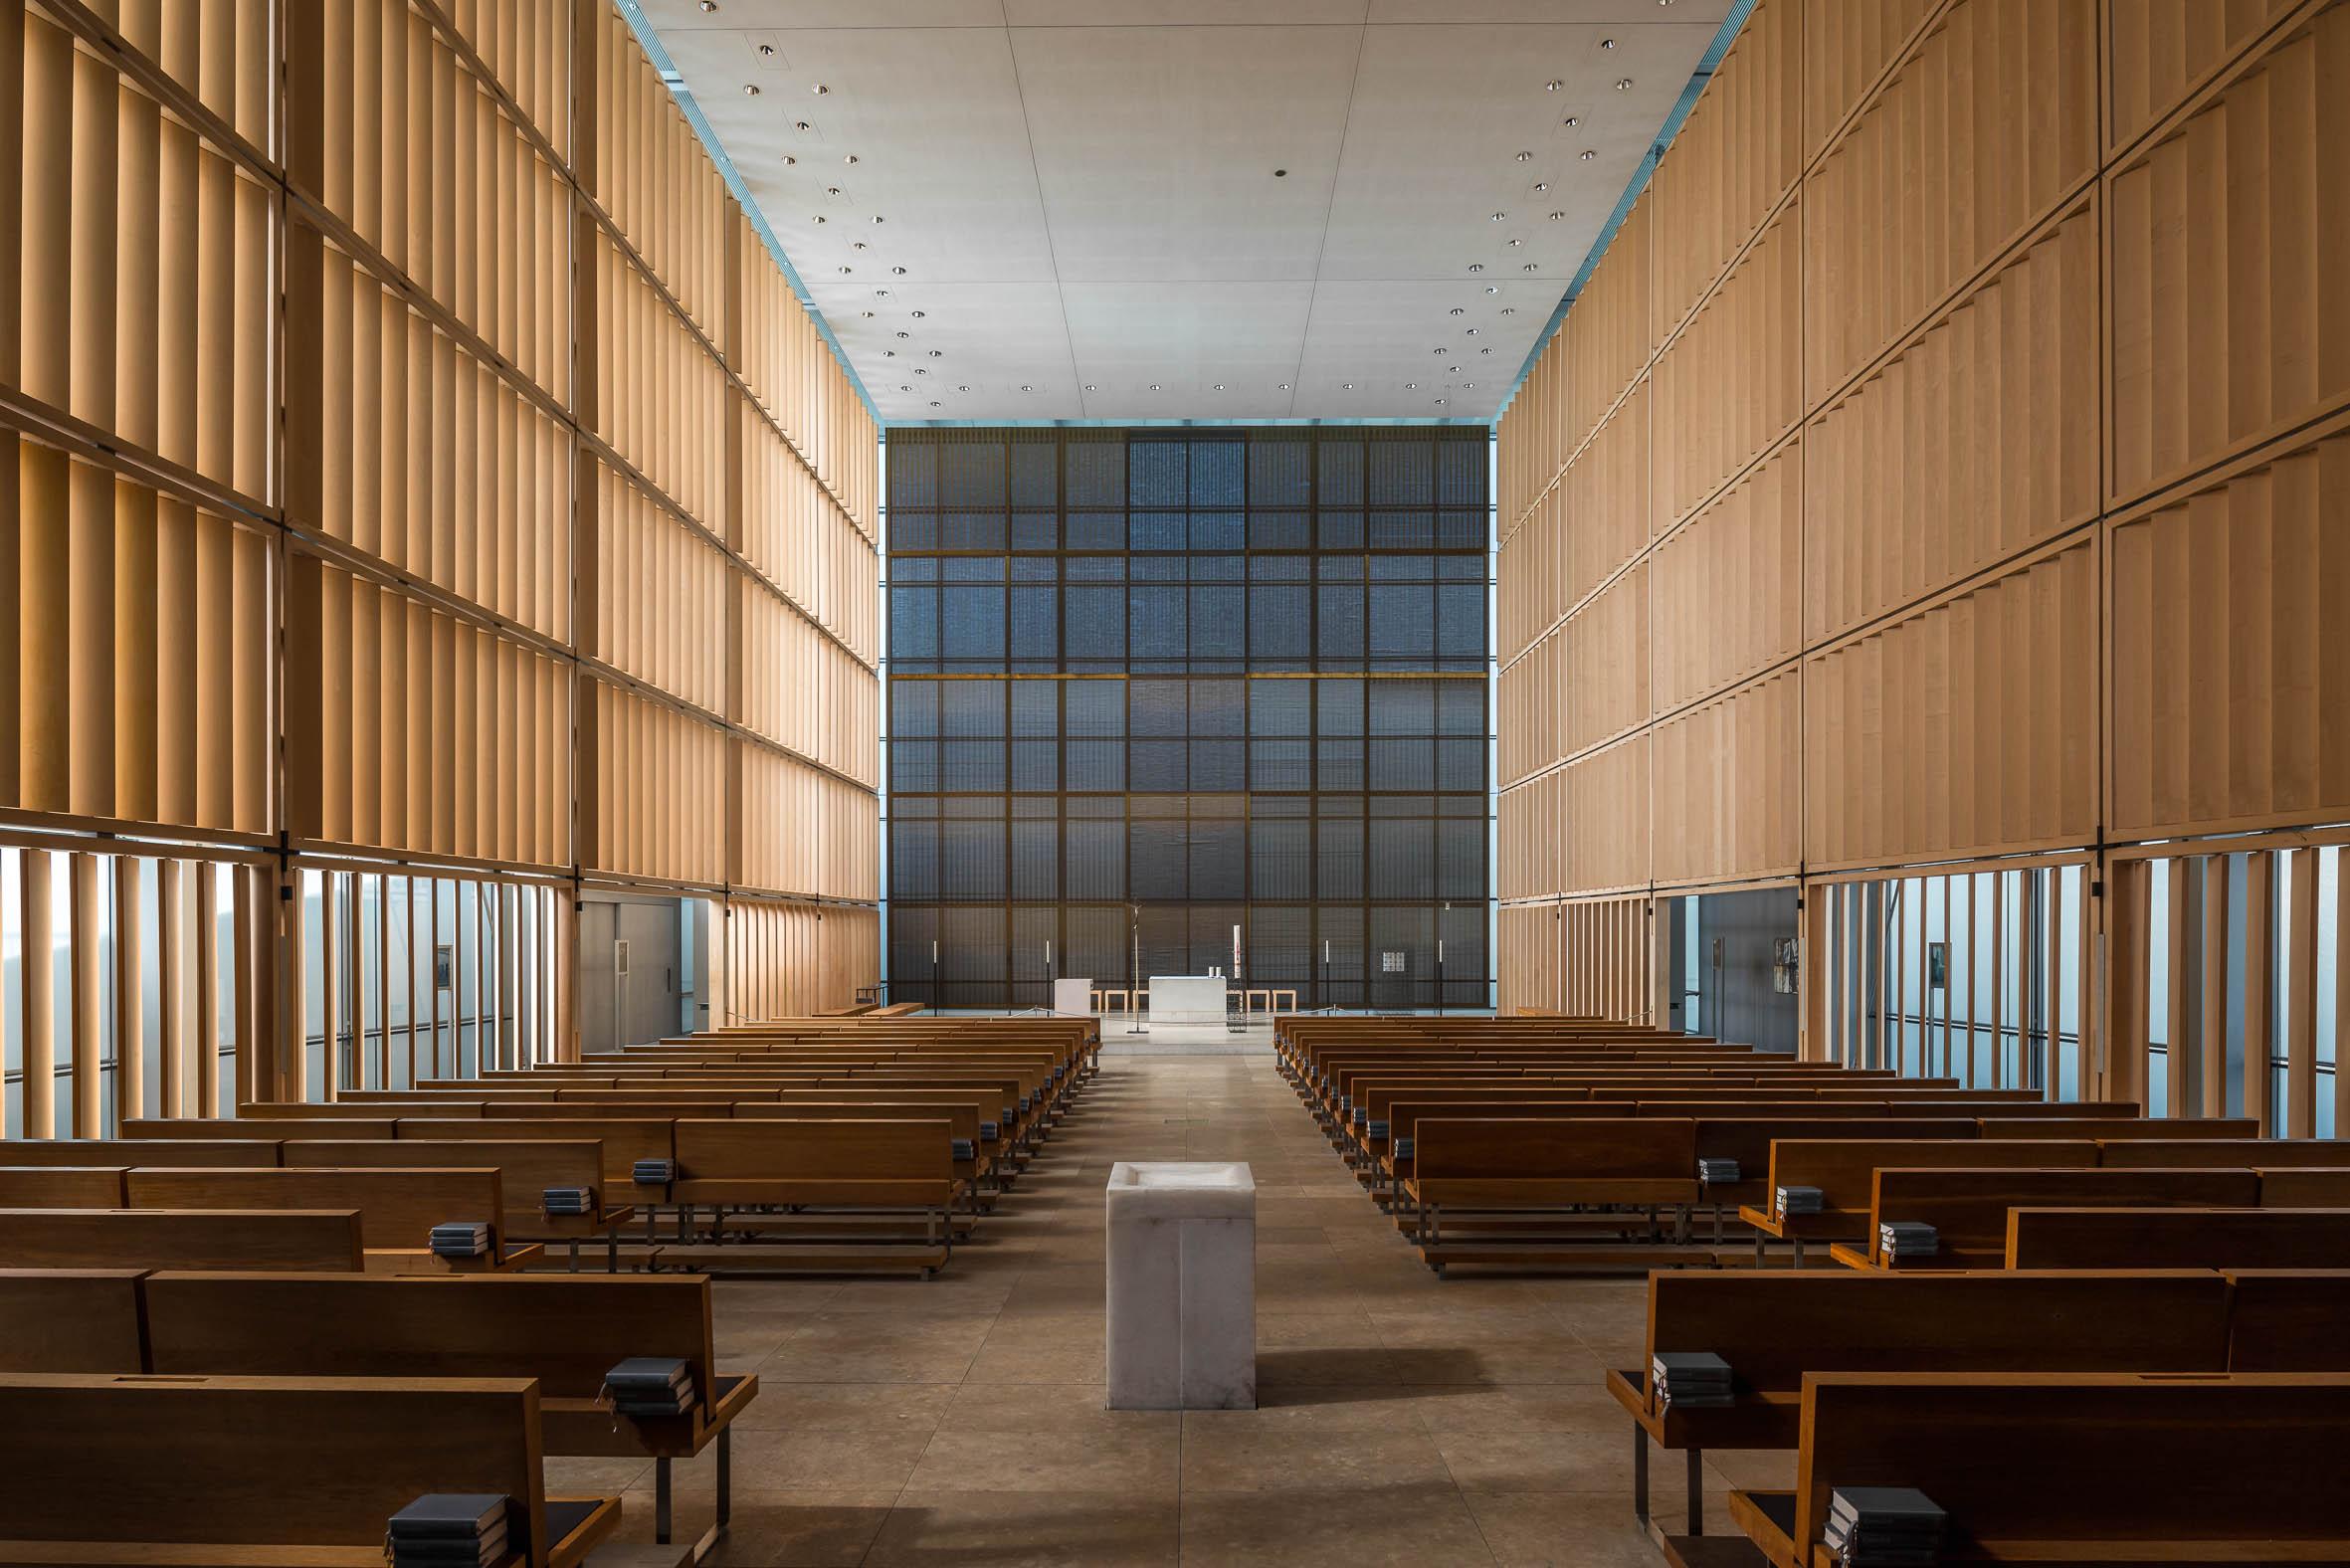 Architekturfotografie Herz-Jesu-Kirche München